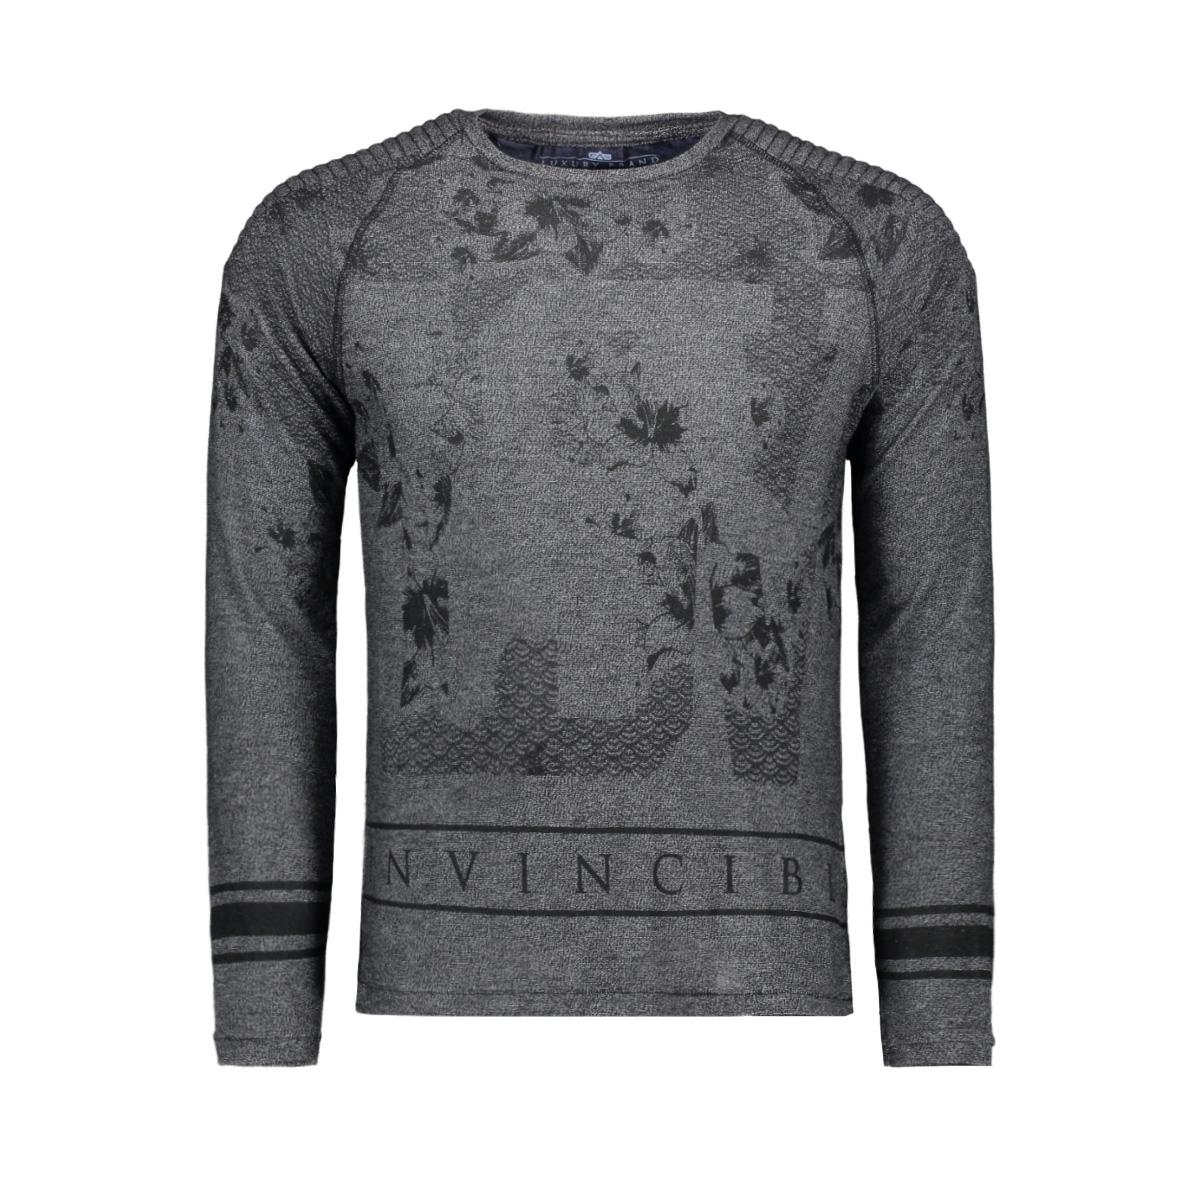 4824 gabbiano t-shirt black